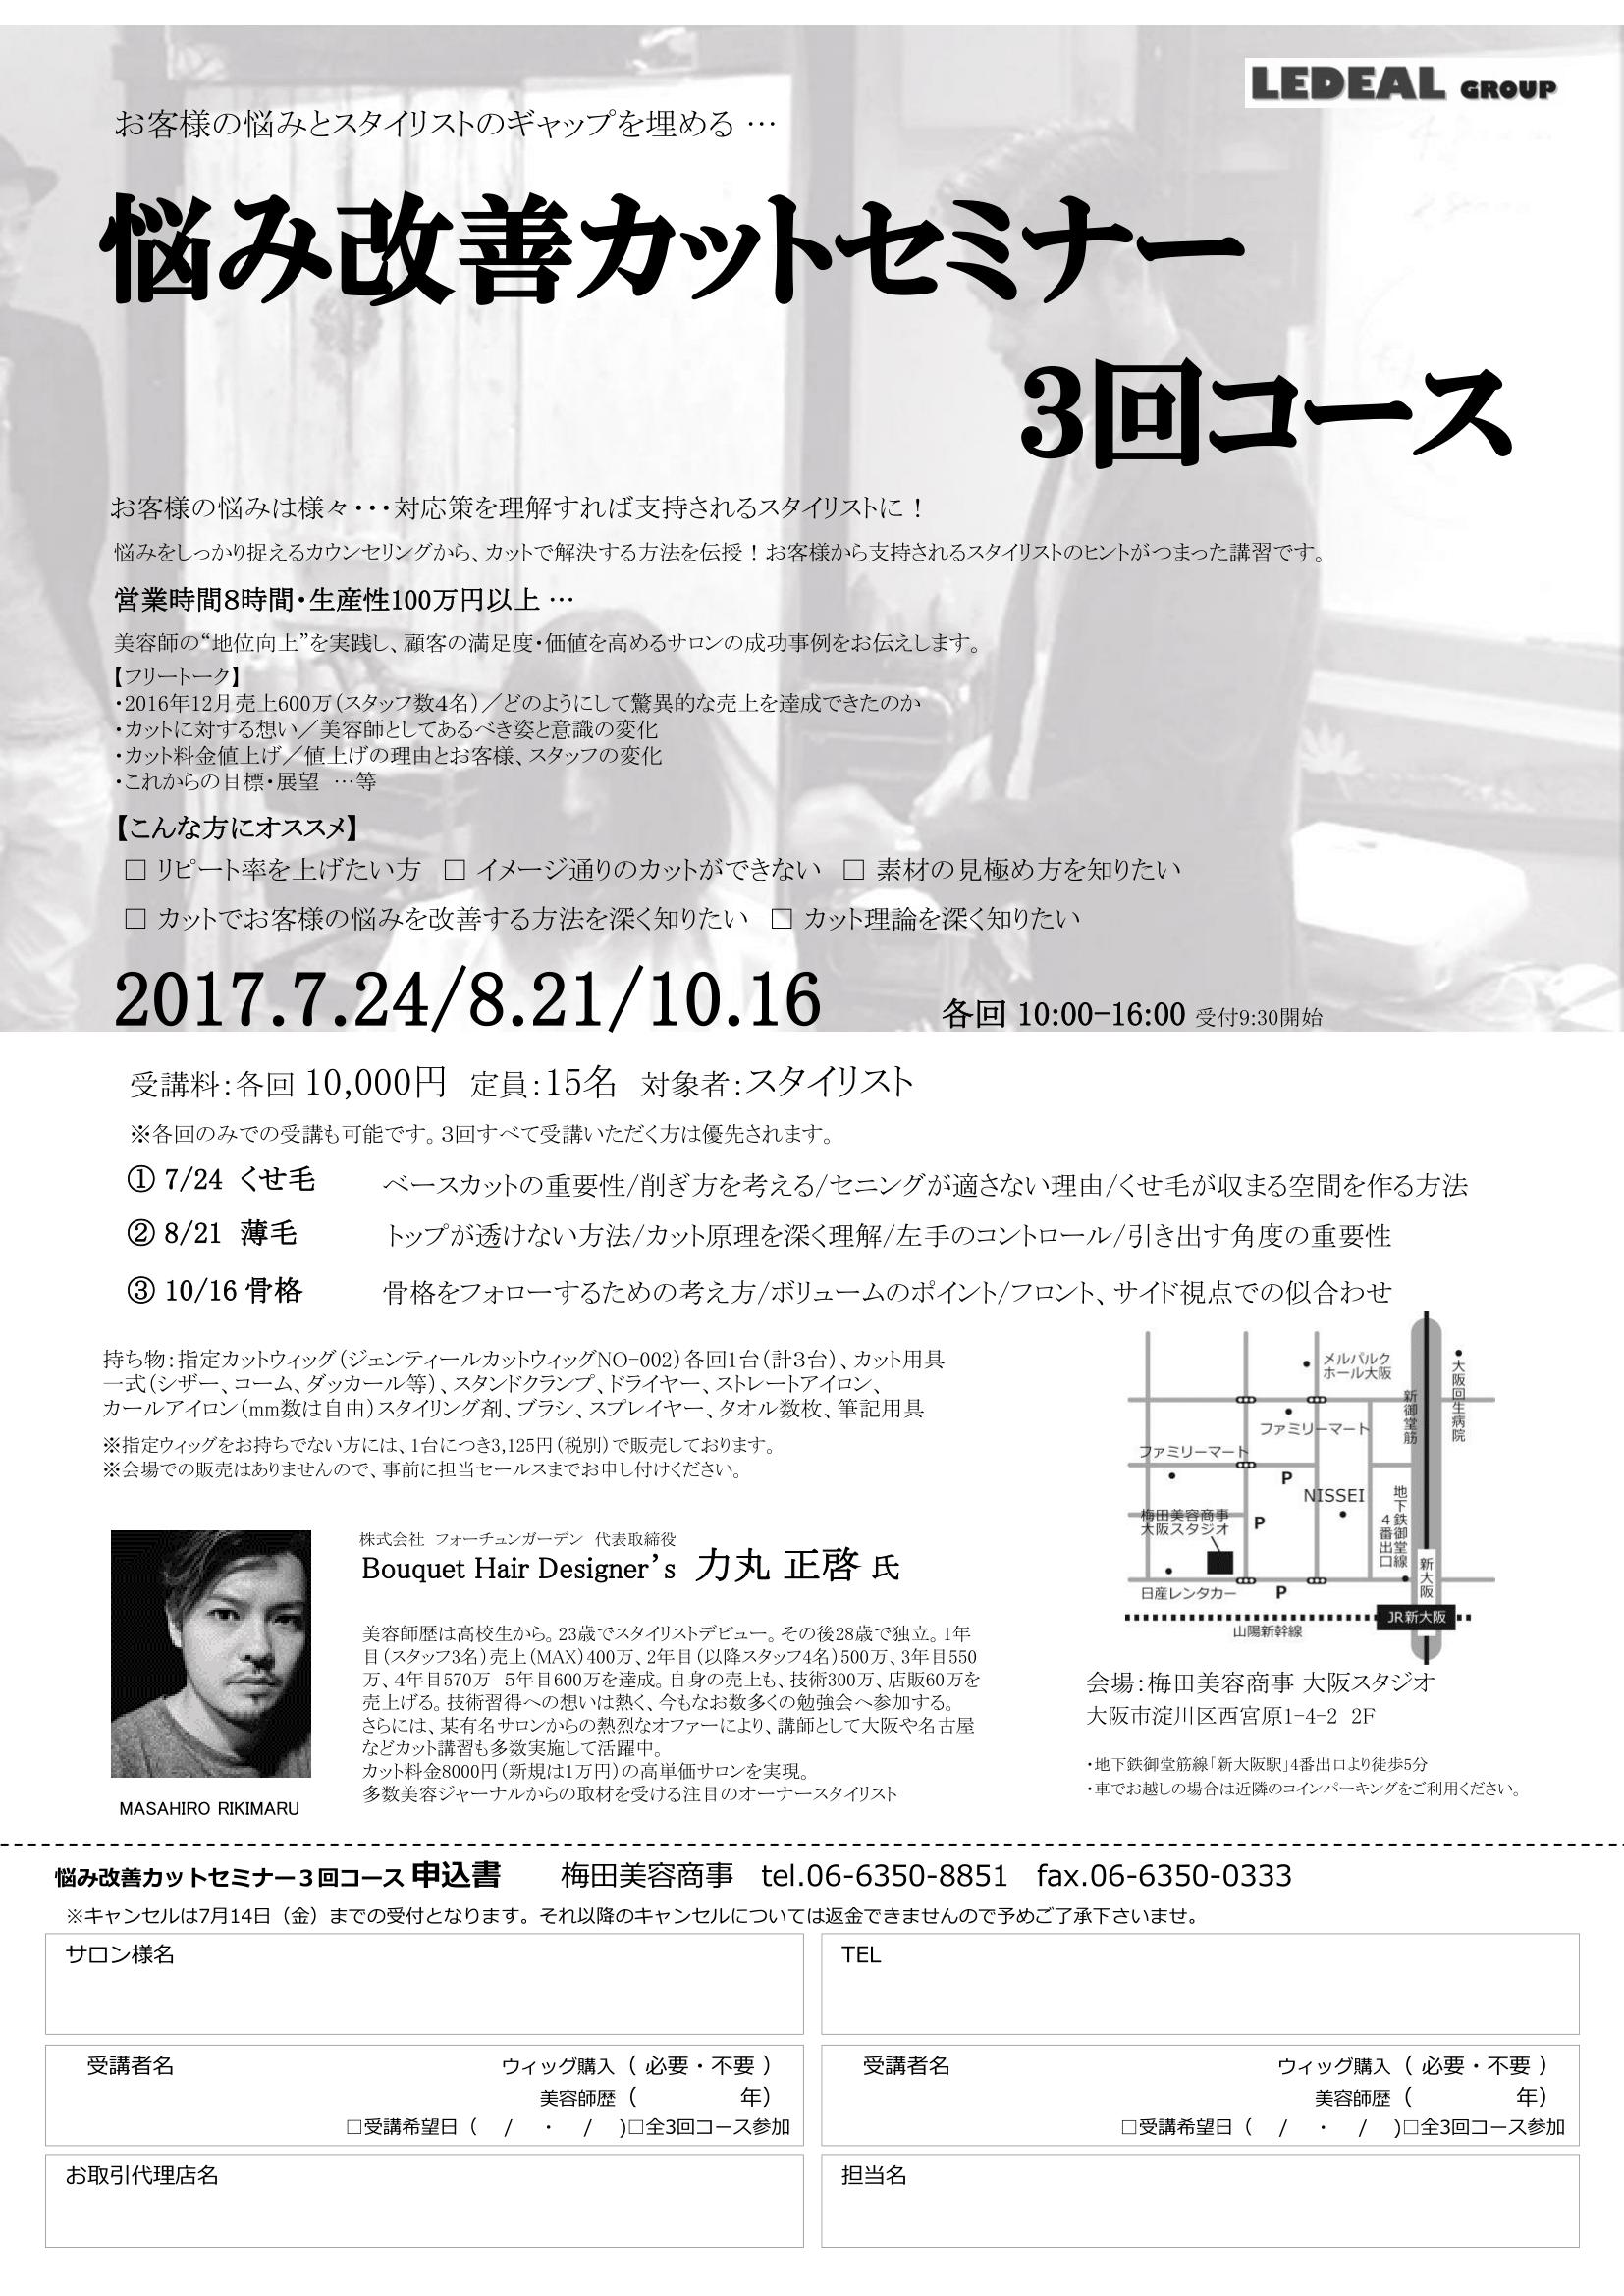 20170724_osaka_悩み改善カット3回